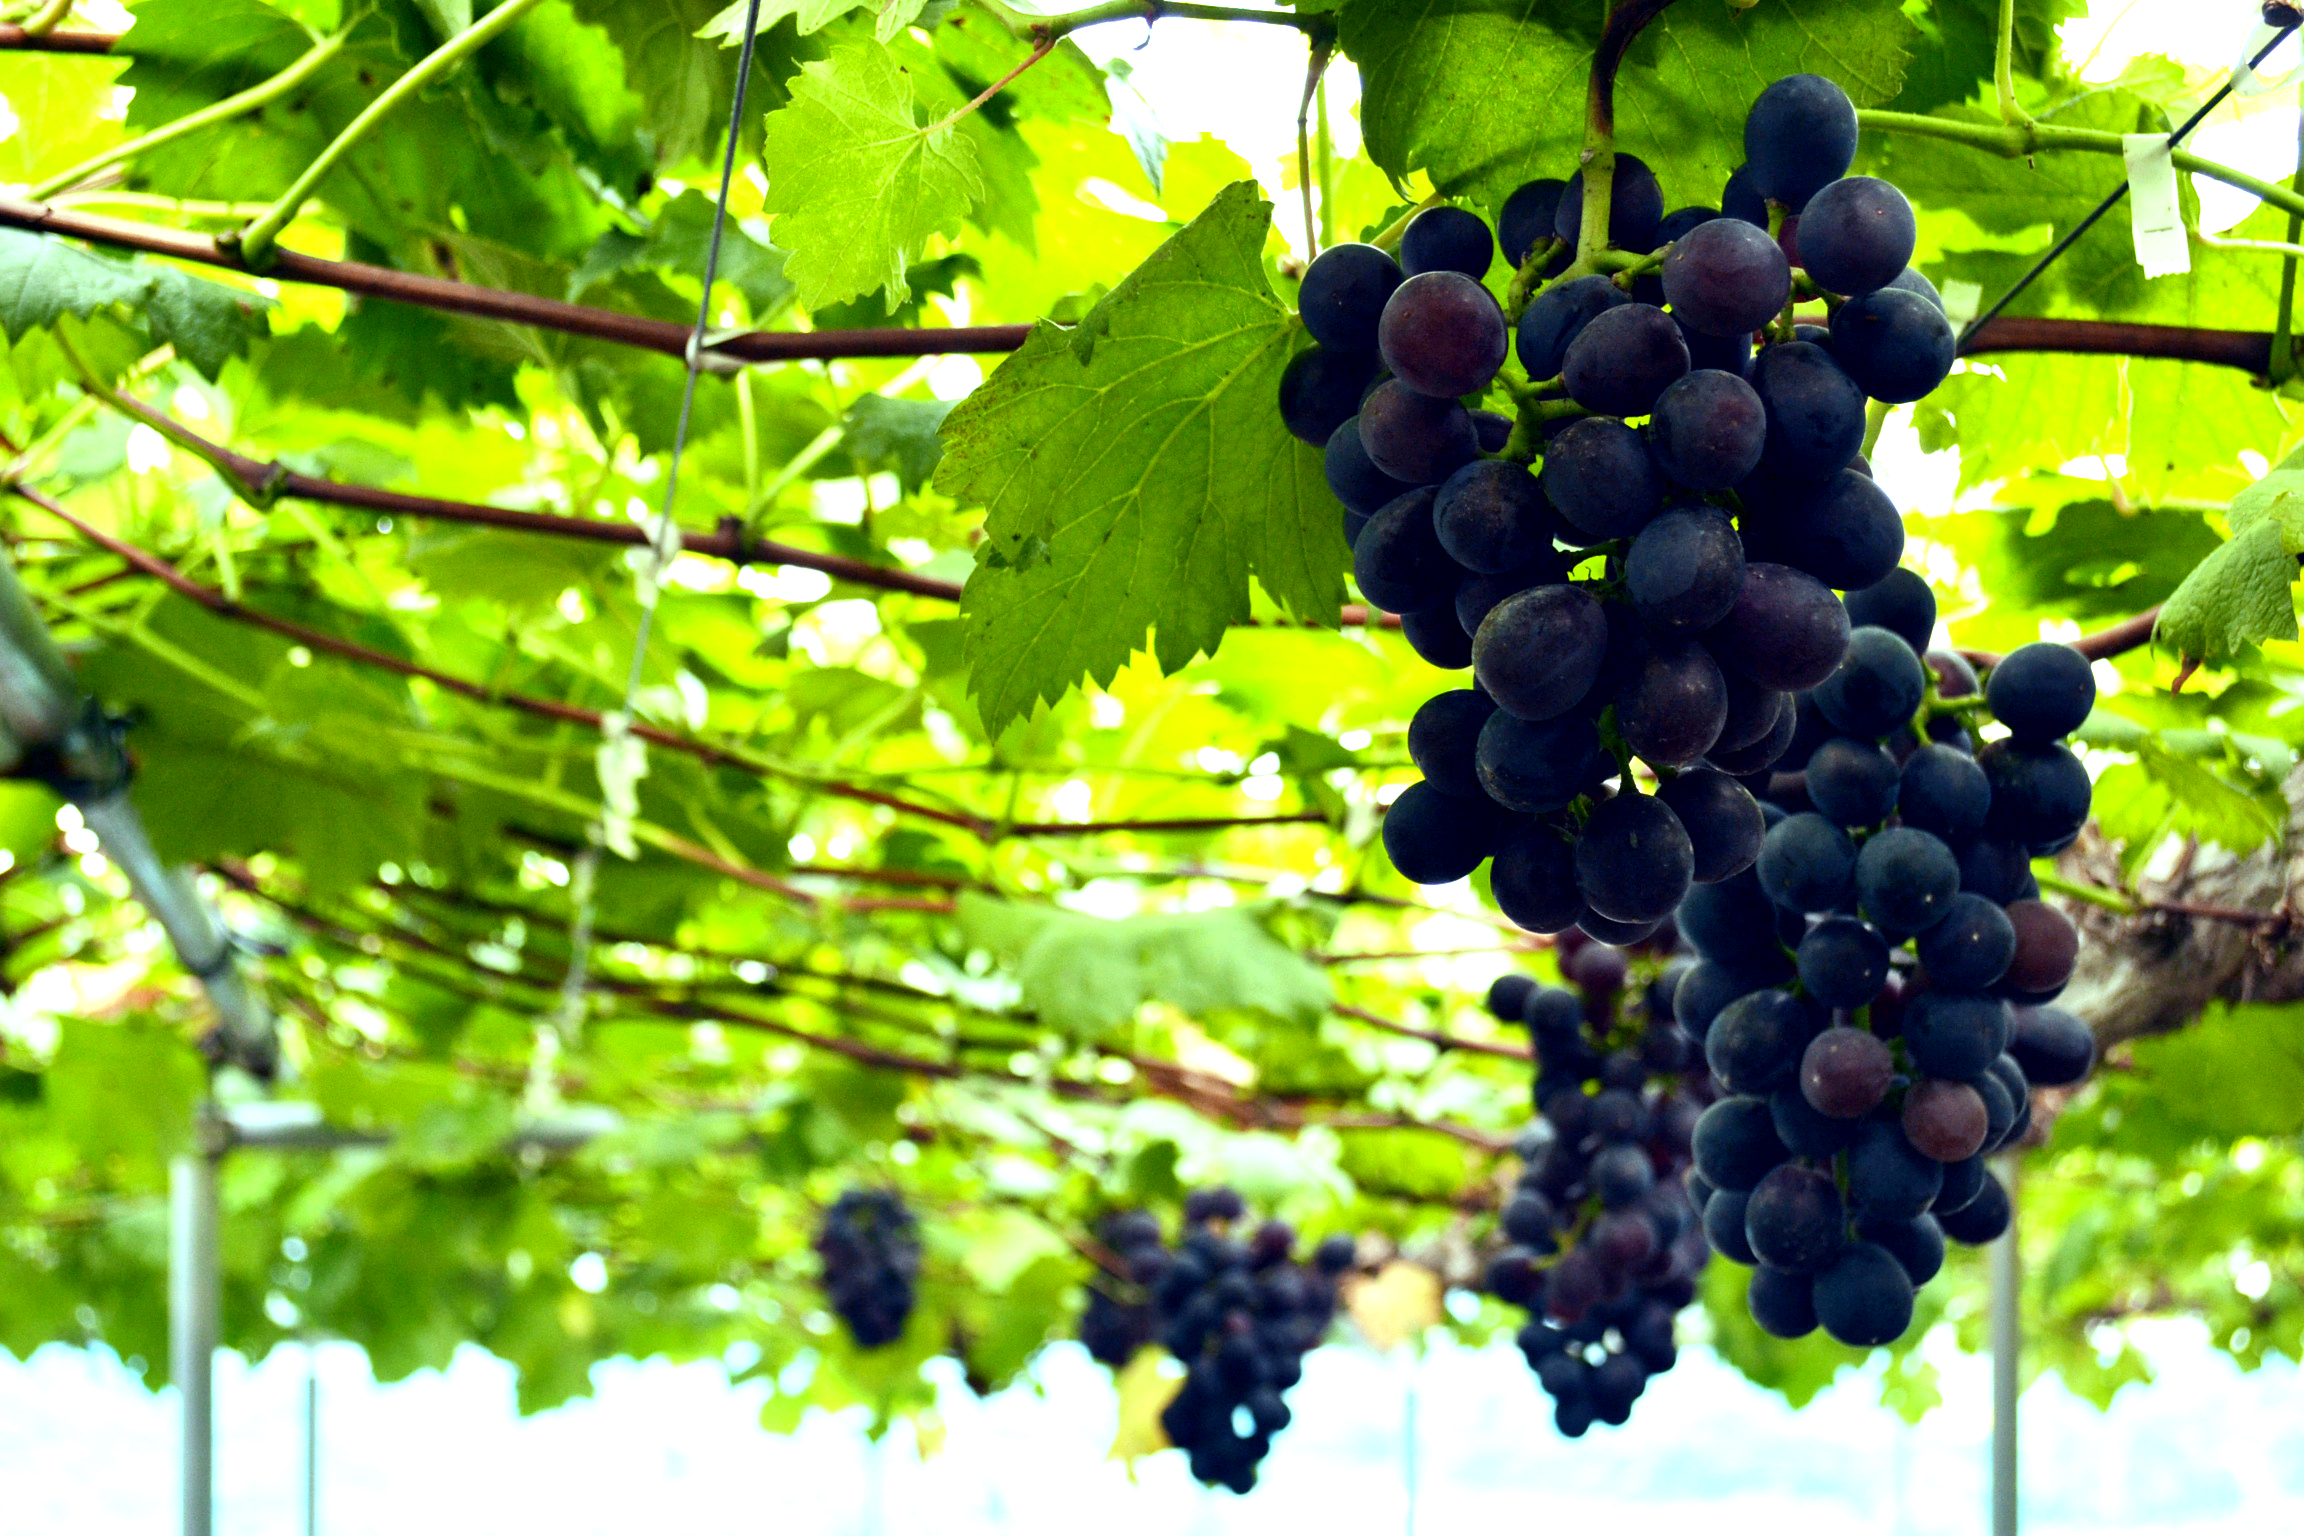 (c)httpwww.kyujin-times.netblogvegefulllife201204post-2.html